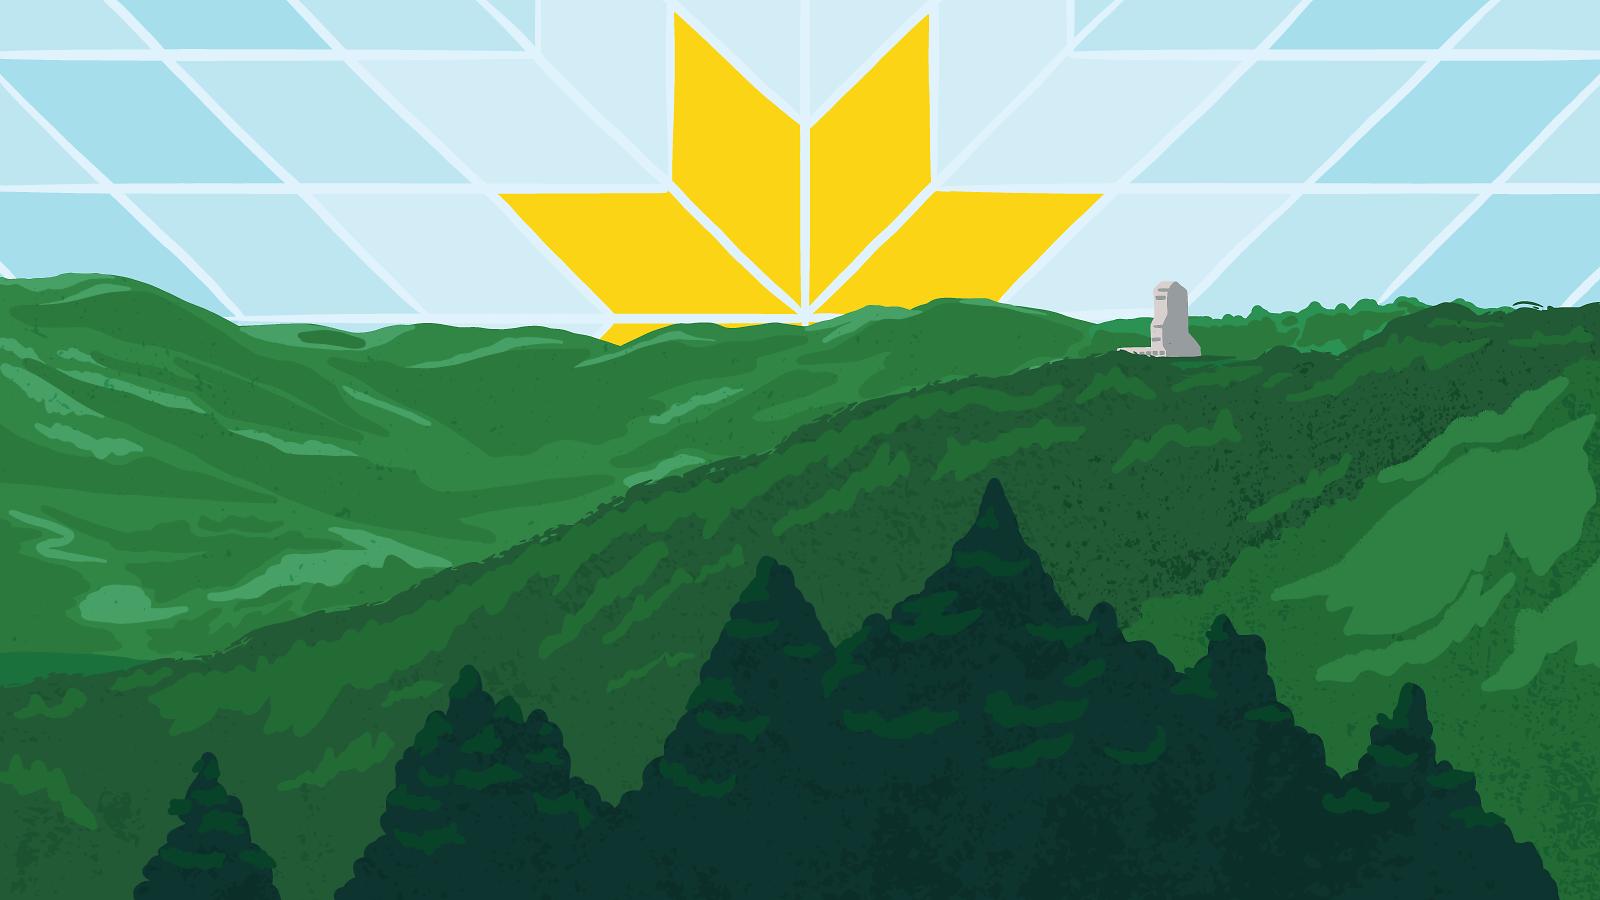 Illustration: A Lakota star rises like the sun behind the Sanford lab area